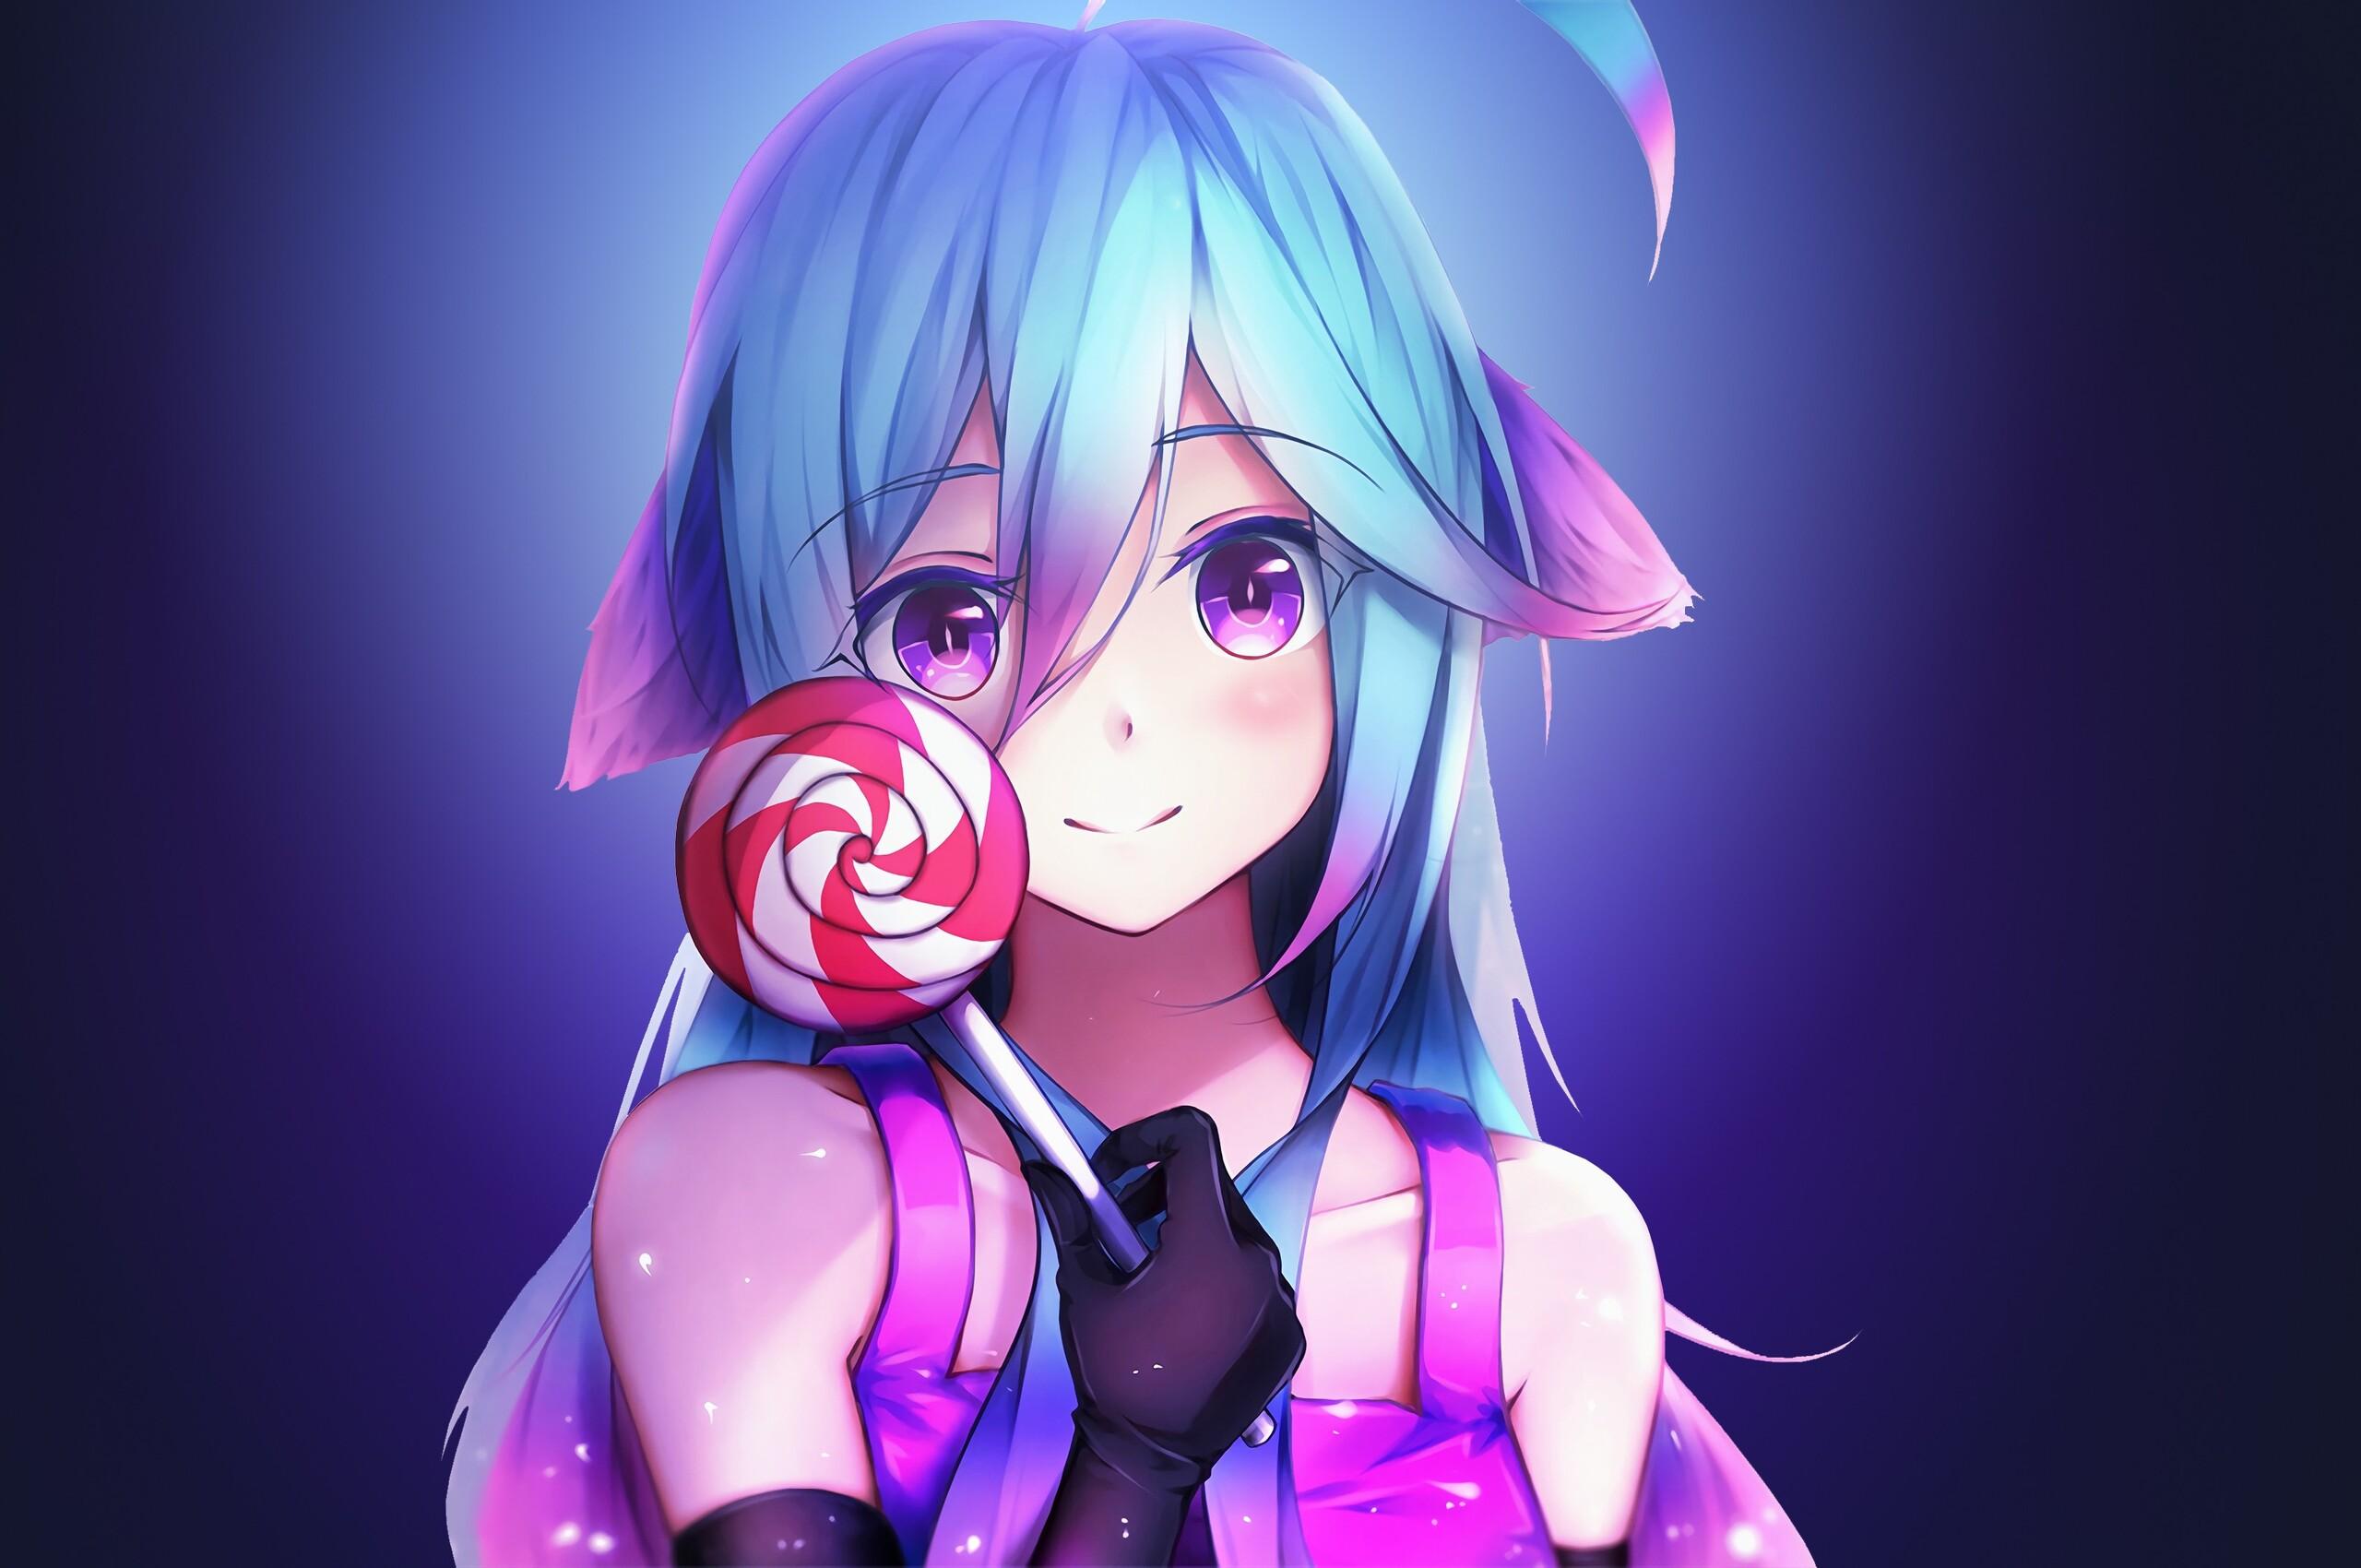 2560x1700 anime girl cute rainbows and lolipop chromebook - Anime backgrounds hd 1920x1080 ...